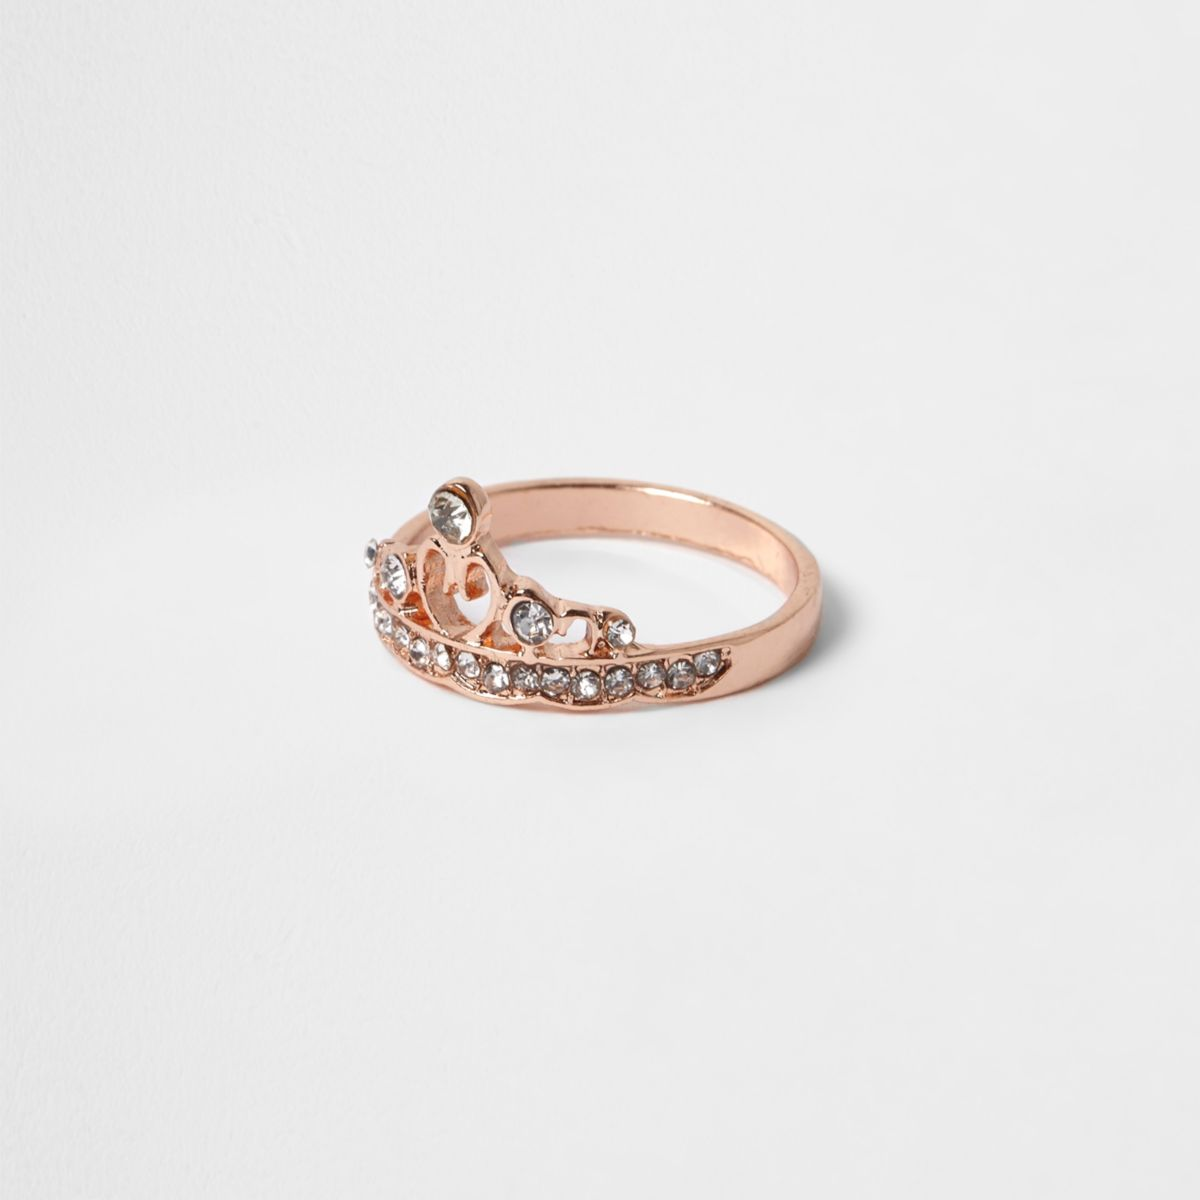 Rose gold tone diamante crown ring